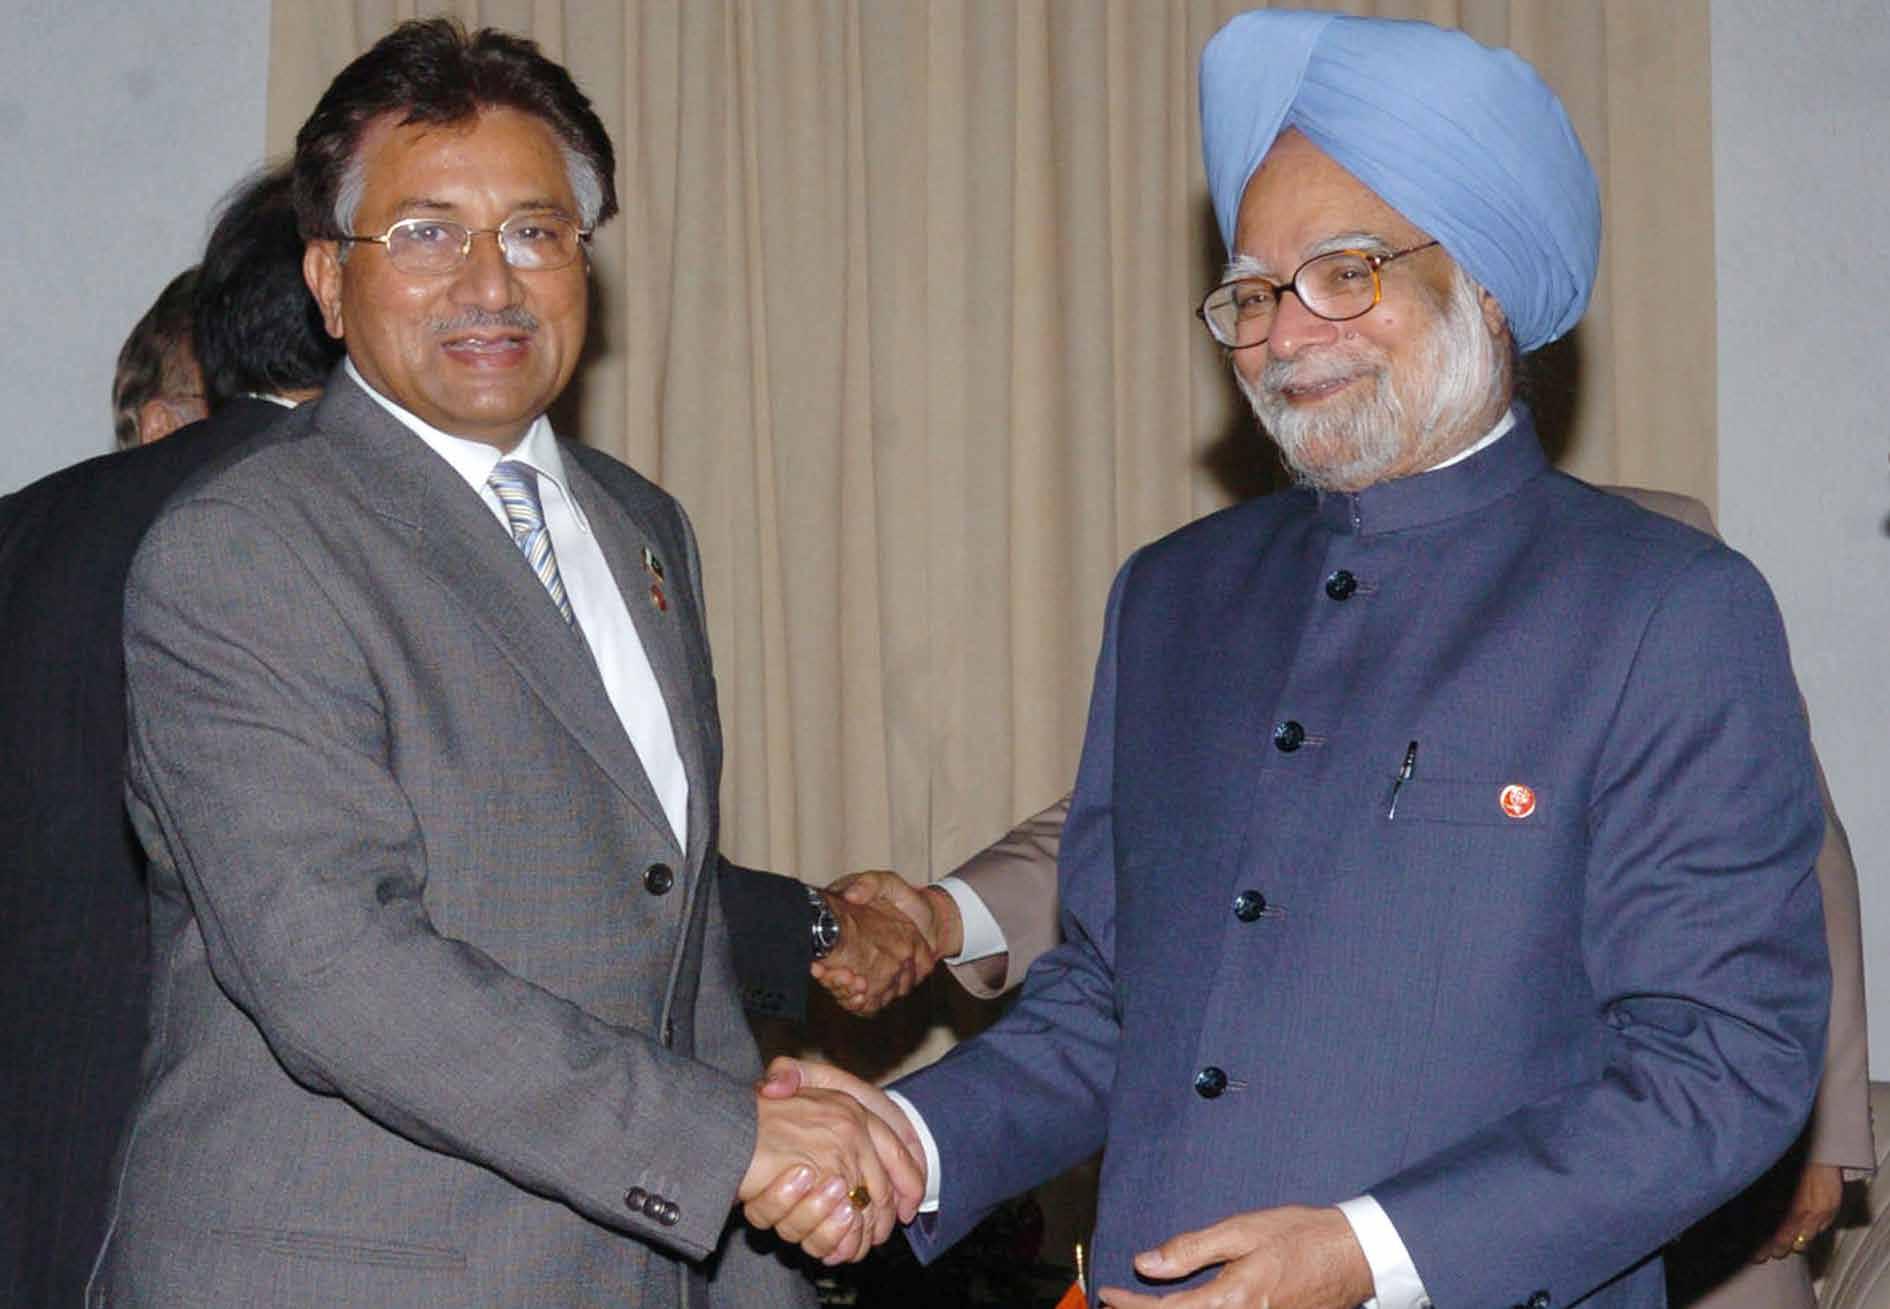 pak pm s kashmir envoy praises modi says manmohan junked invitation